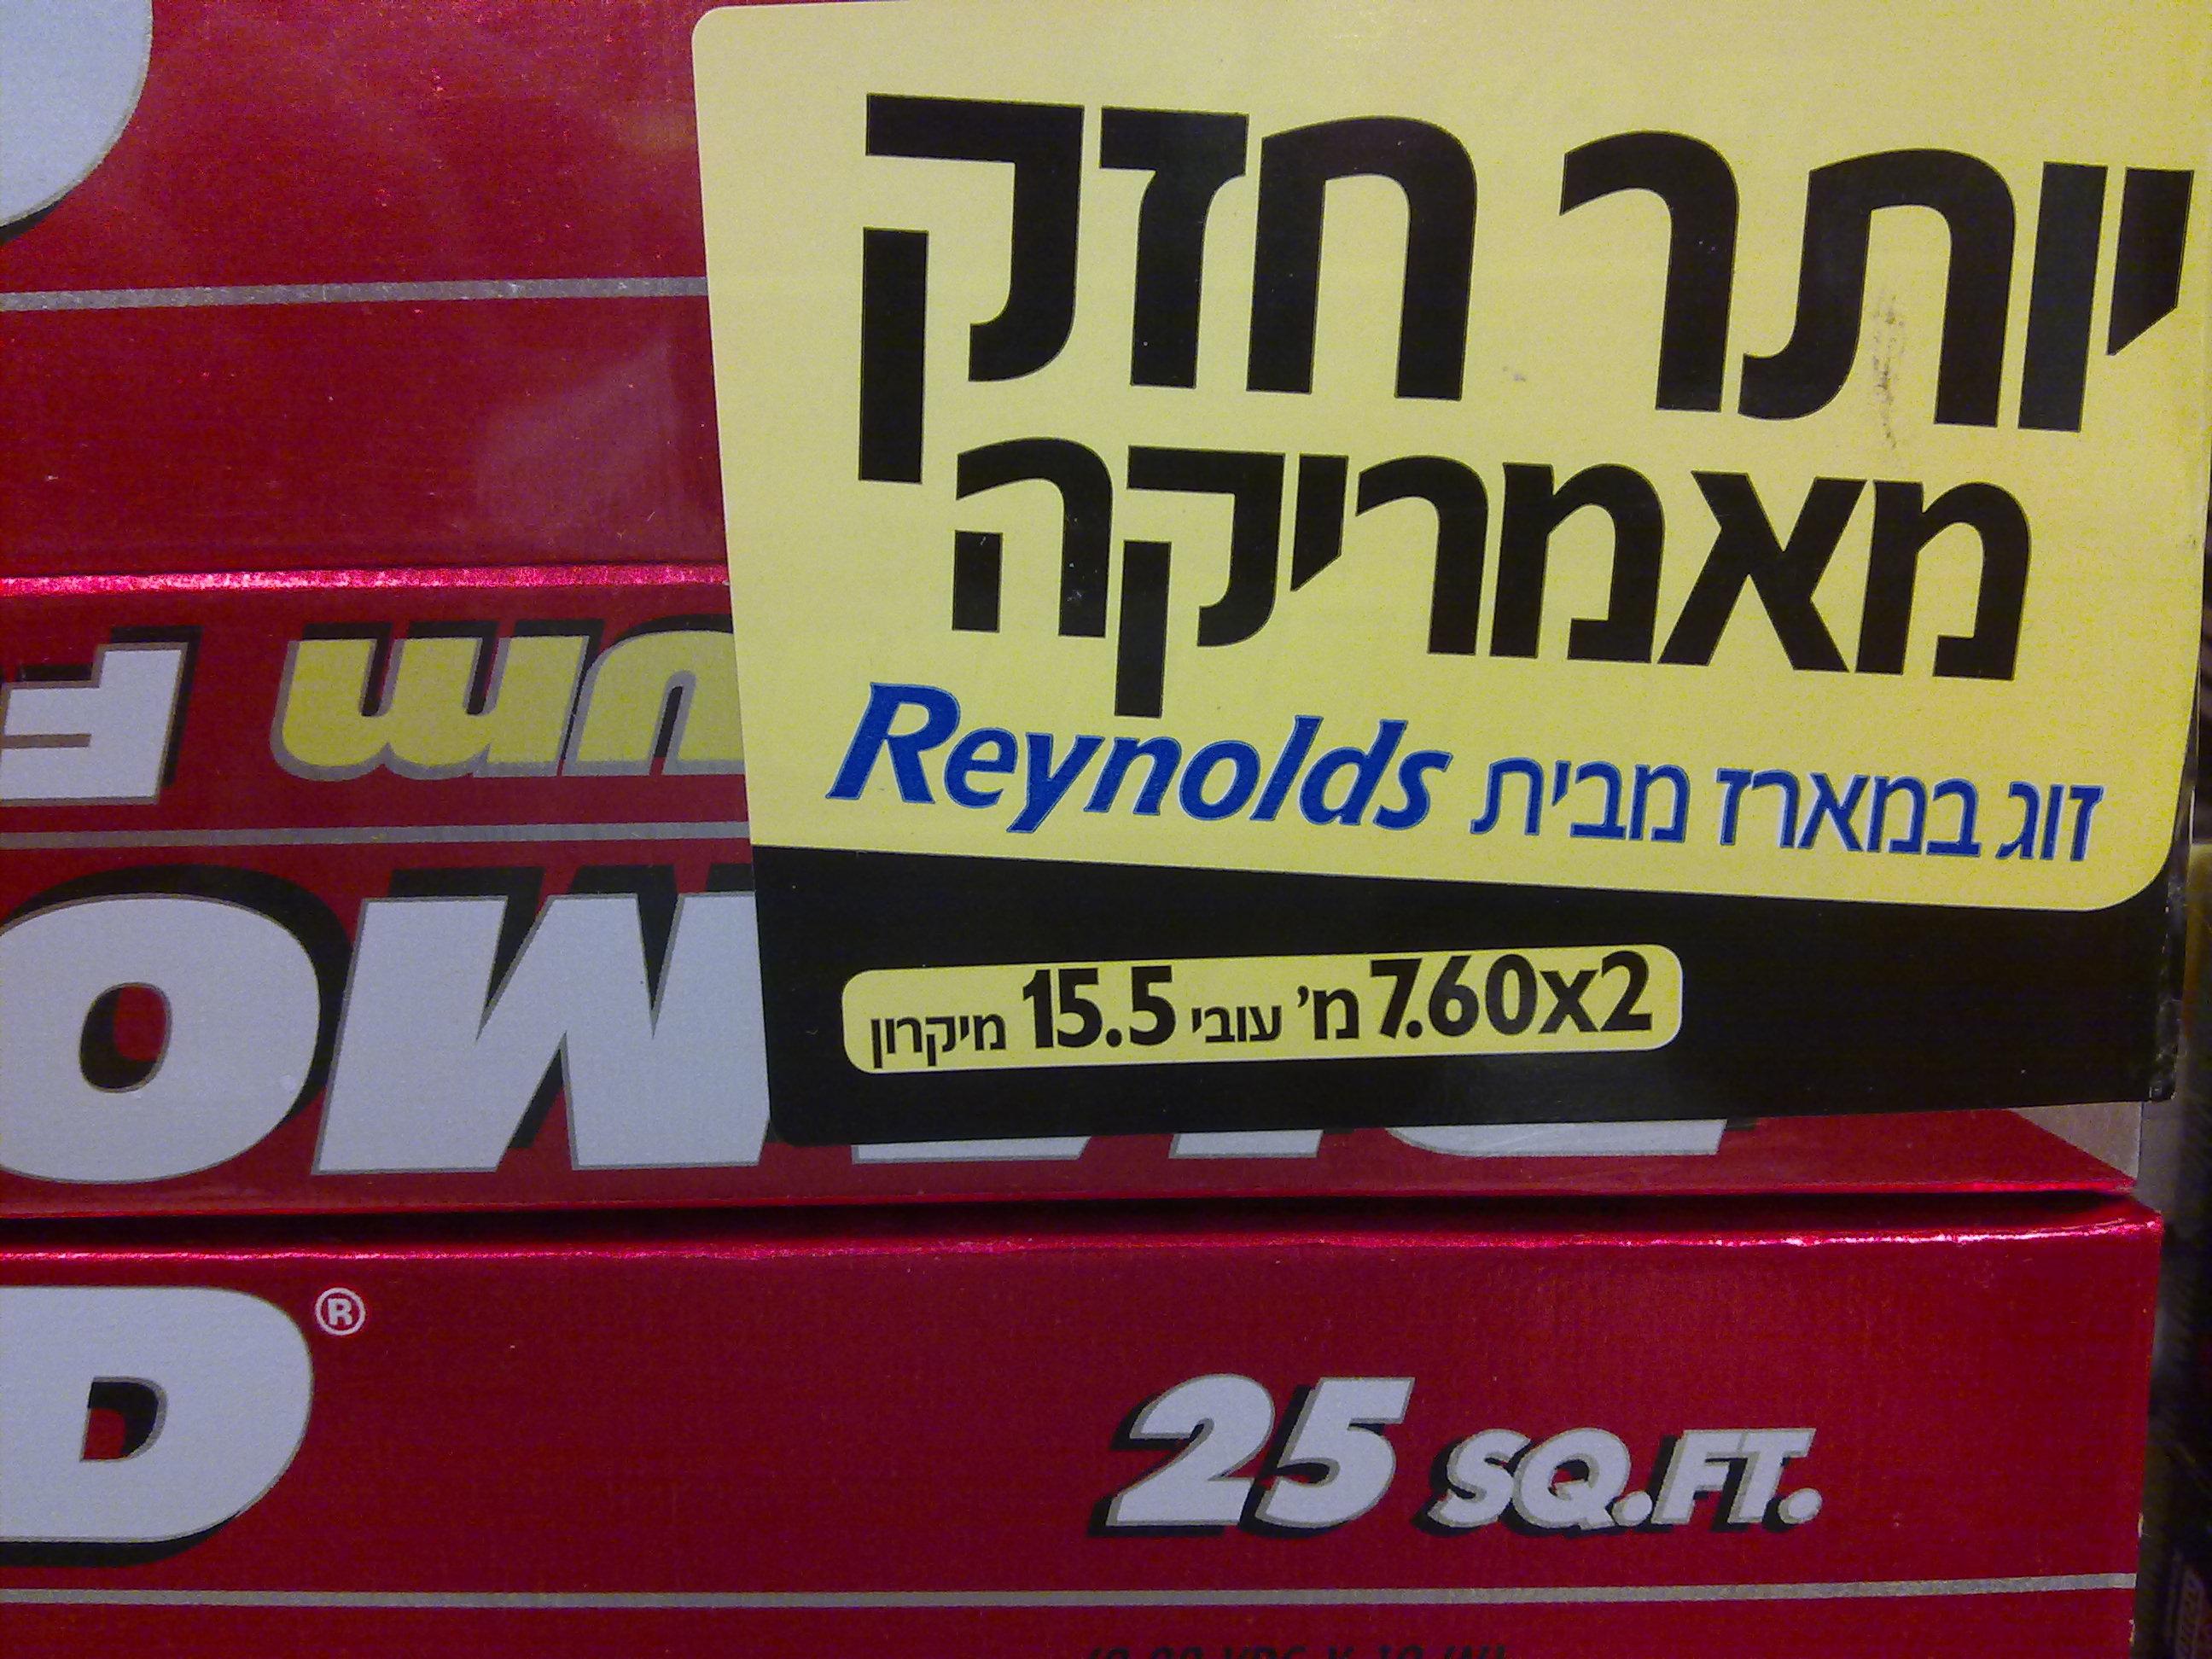 Reynolds - רדיד אלומיניום